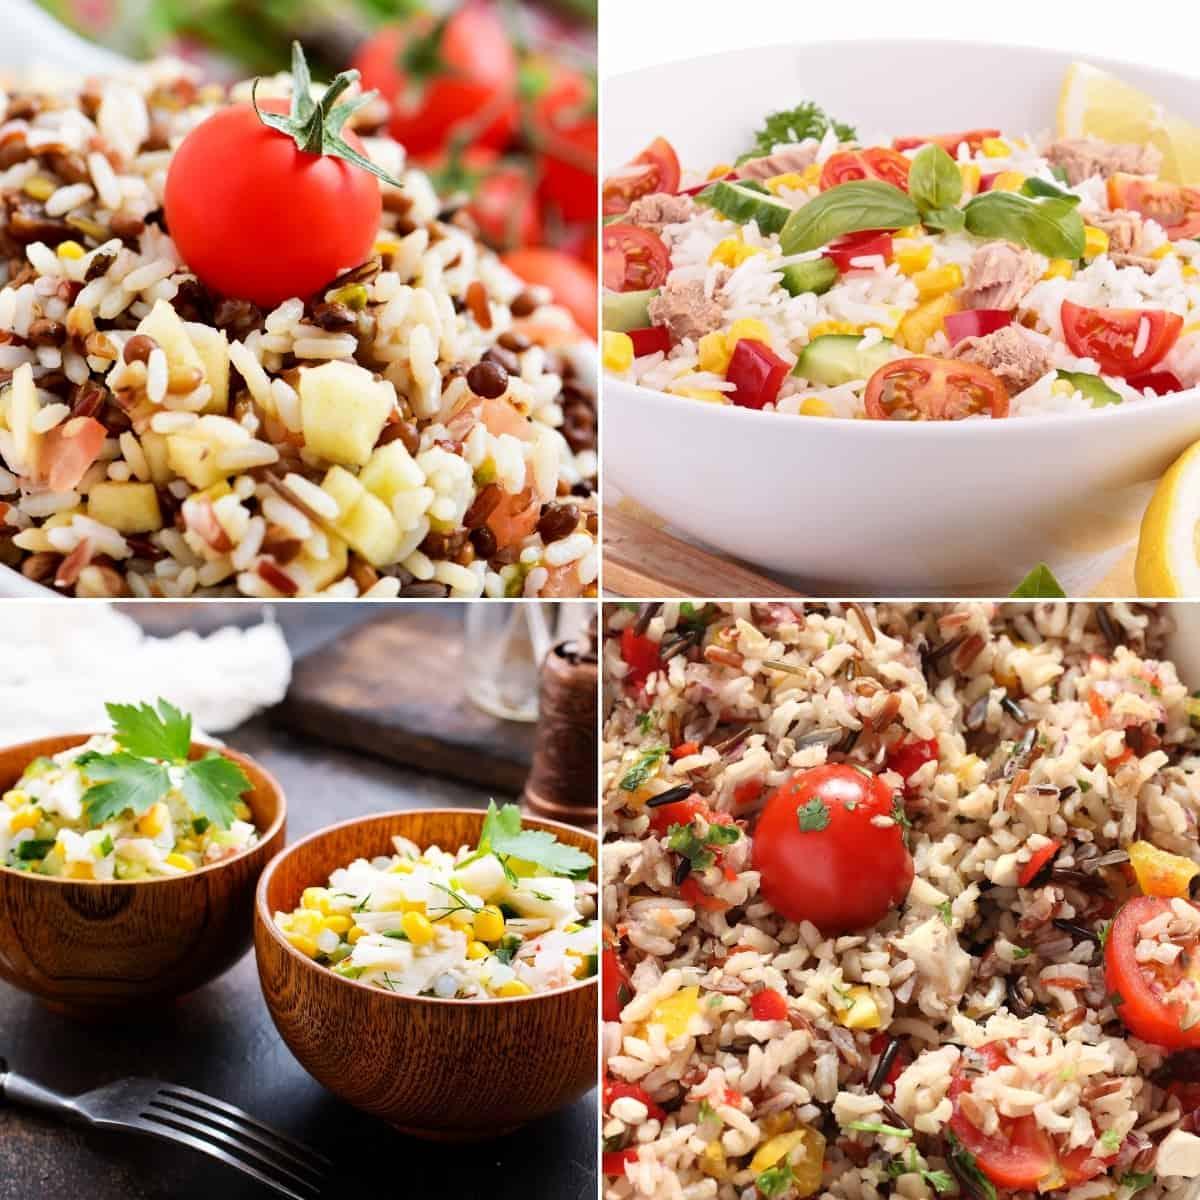 Summer rice salad recipes collage